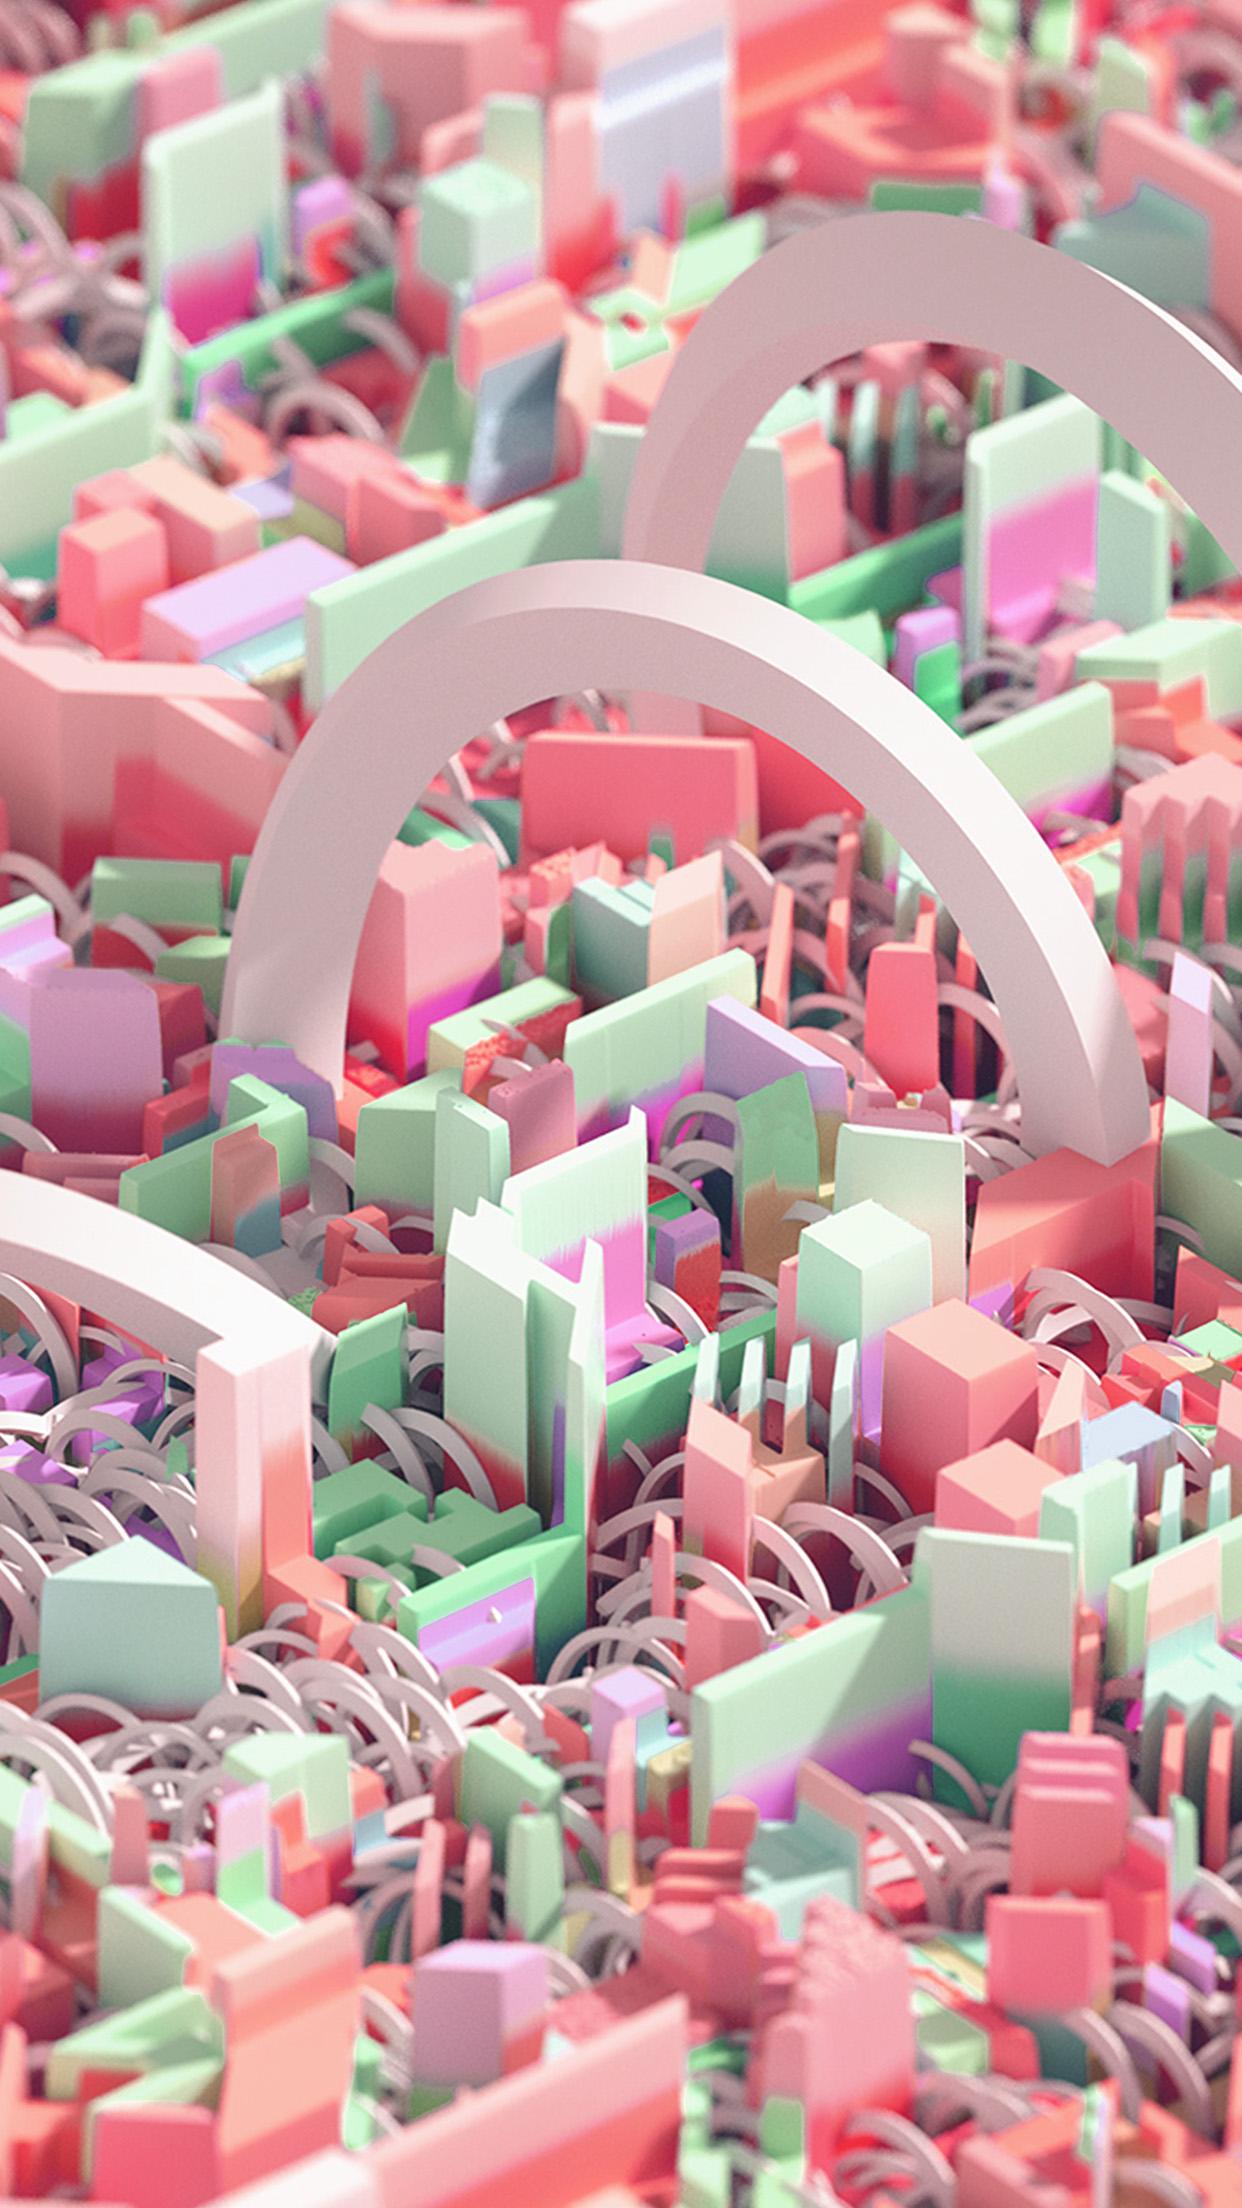 Vw86 Cute Art Abstract 3d Pattern Background Pink Wallpaper